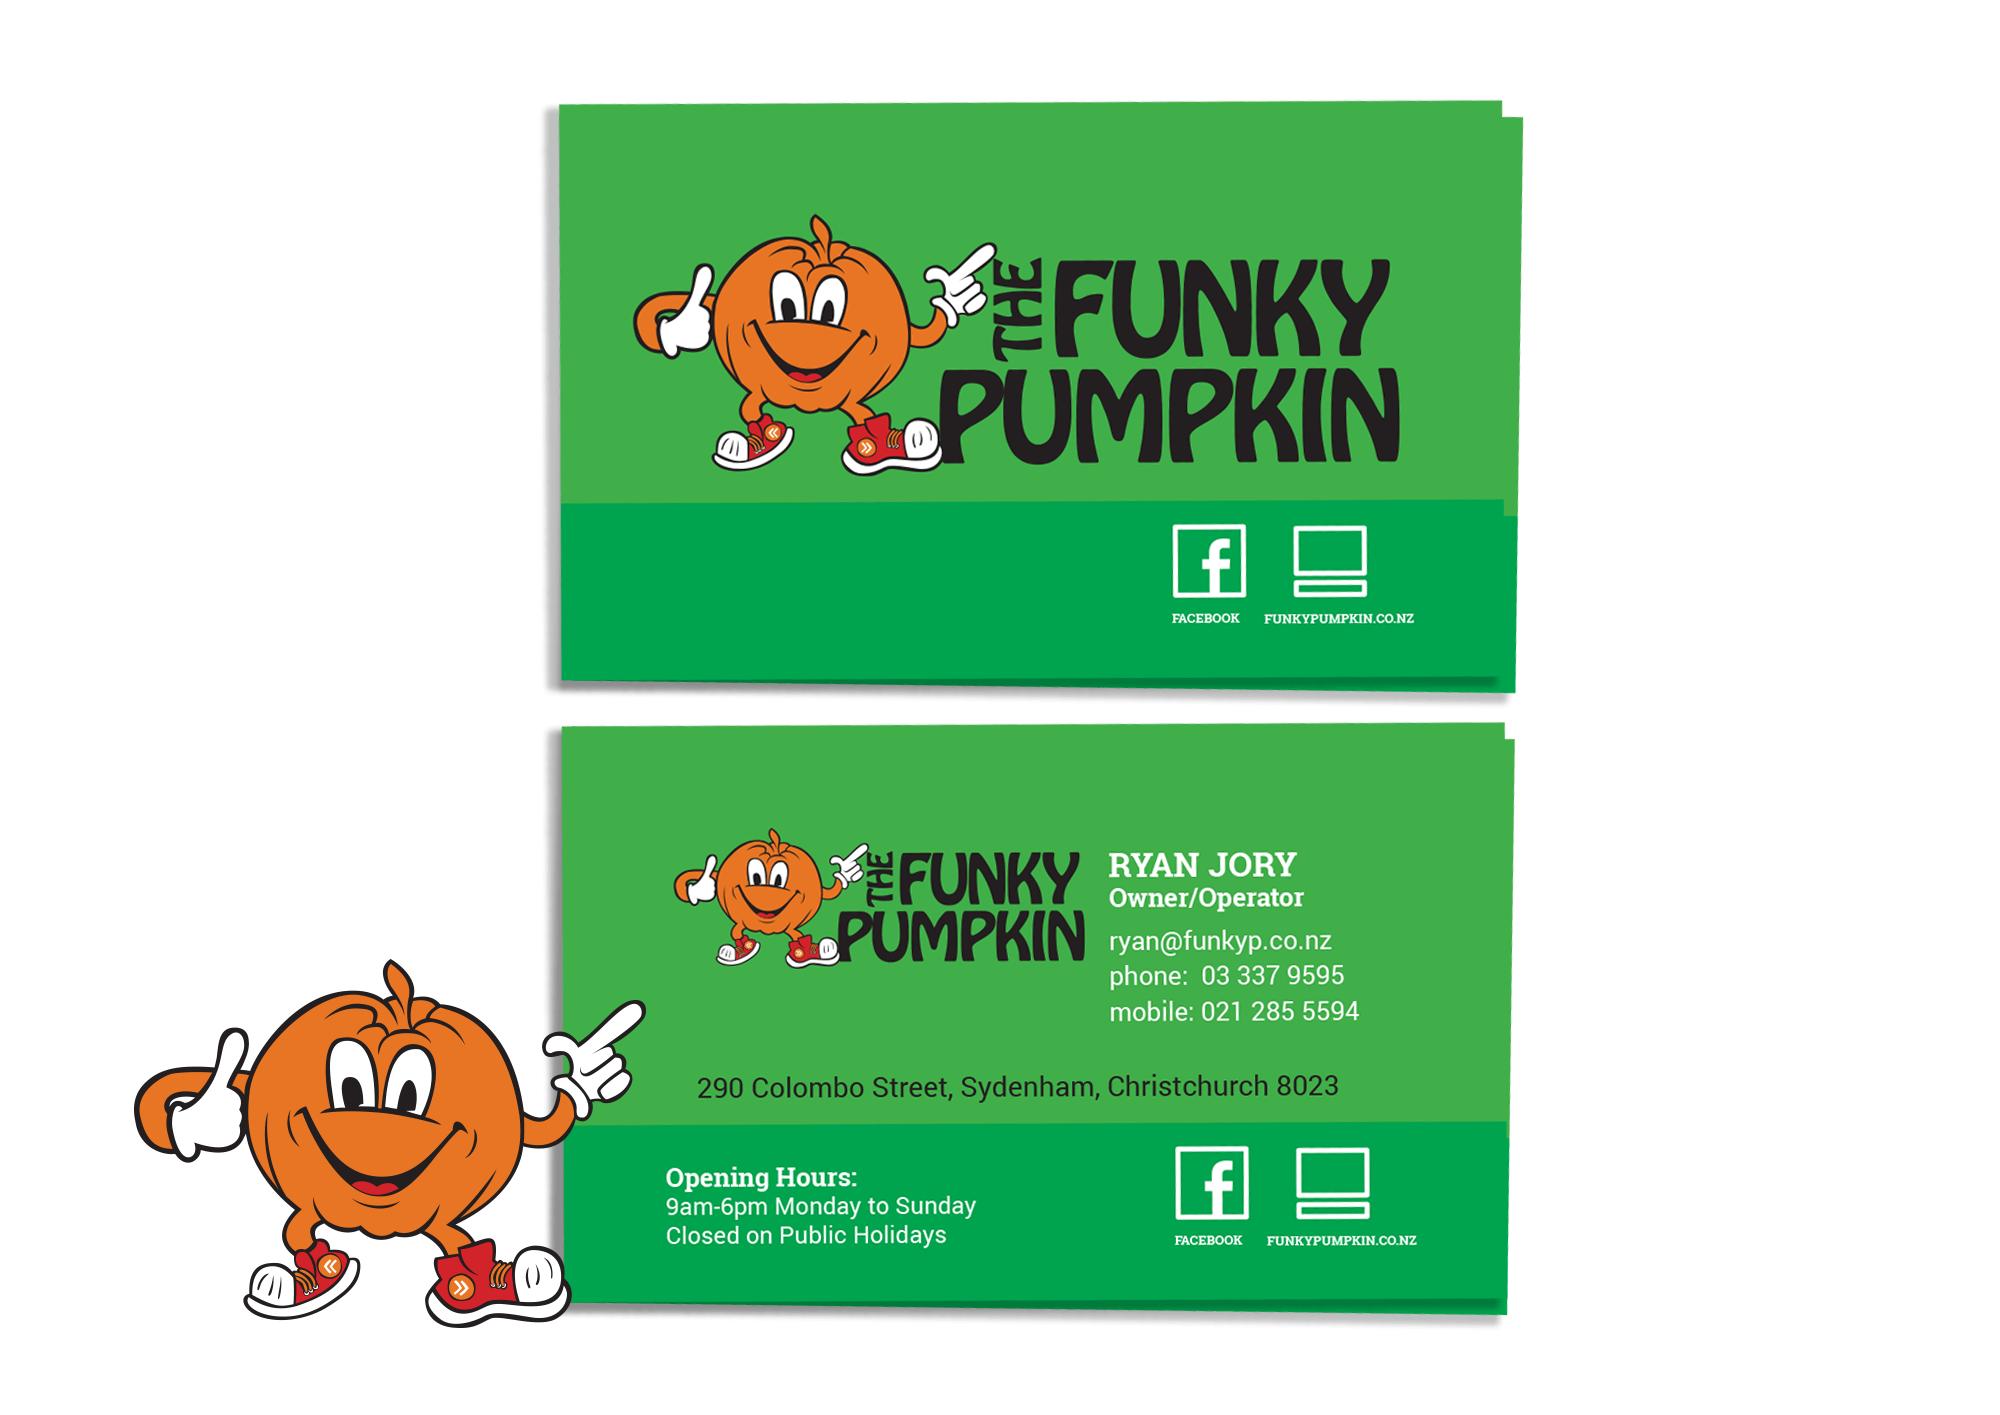 The Funky Pumpkin Business Card